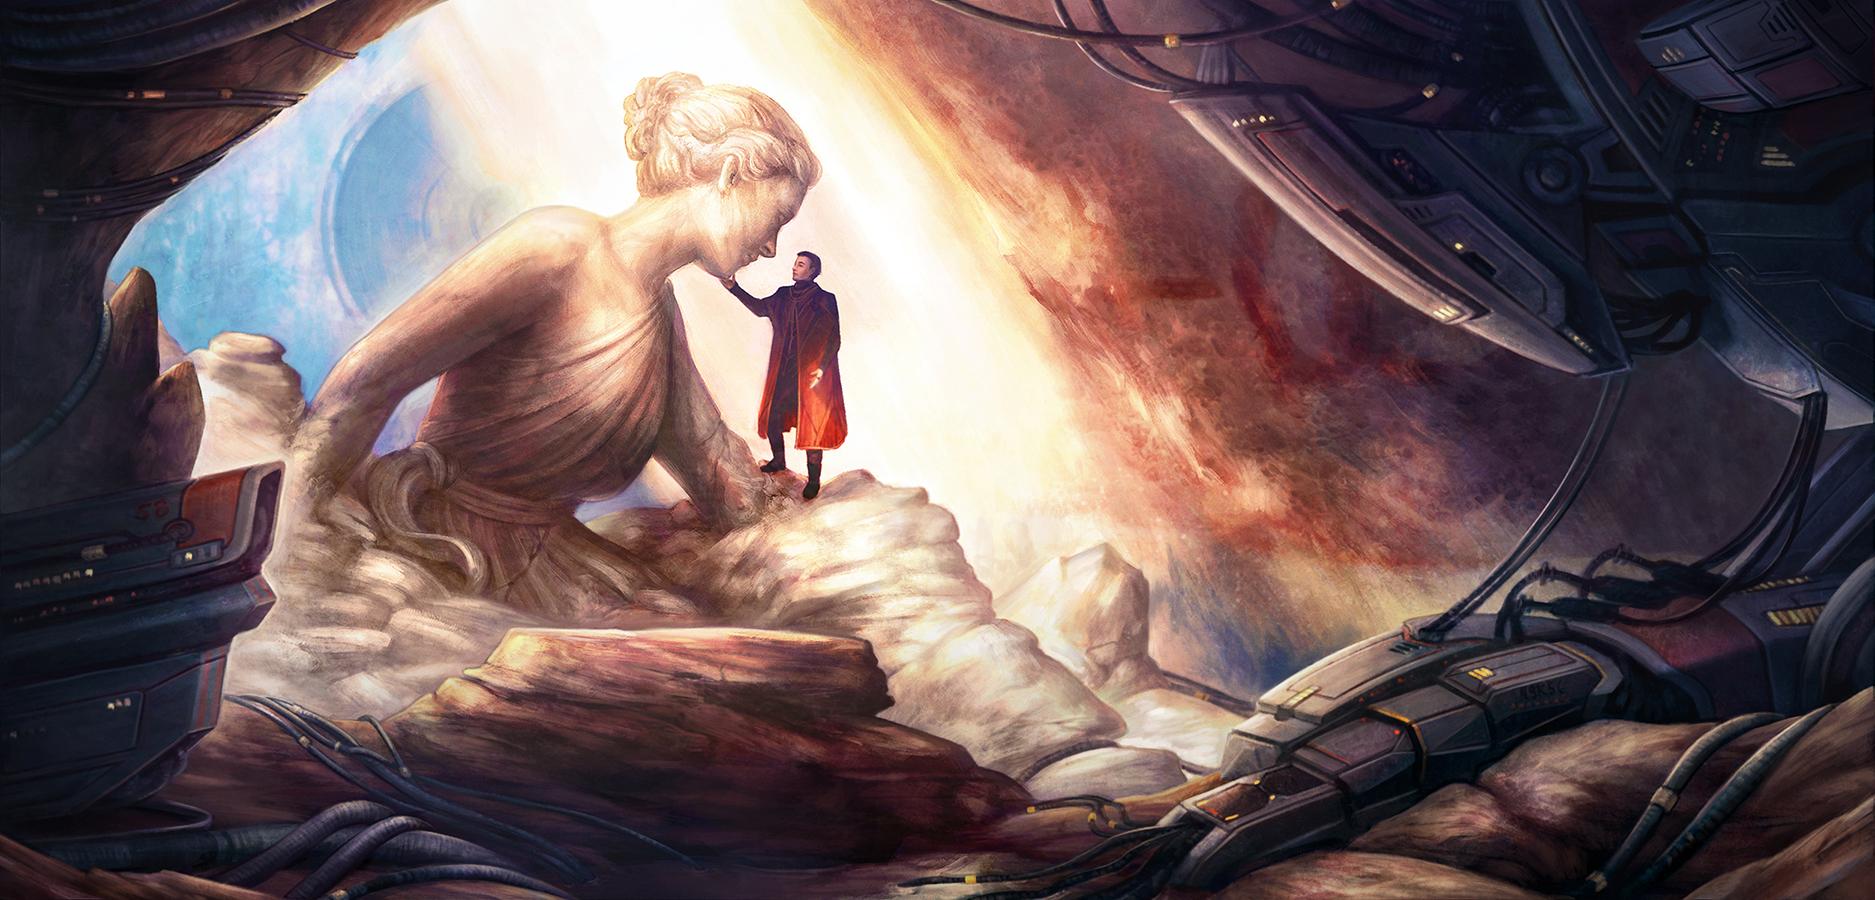 I am Ozymandias, look upon my works, ye mighty, and despair. Art by Jen Santos.